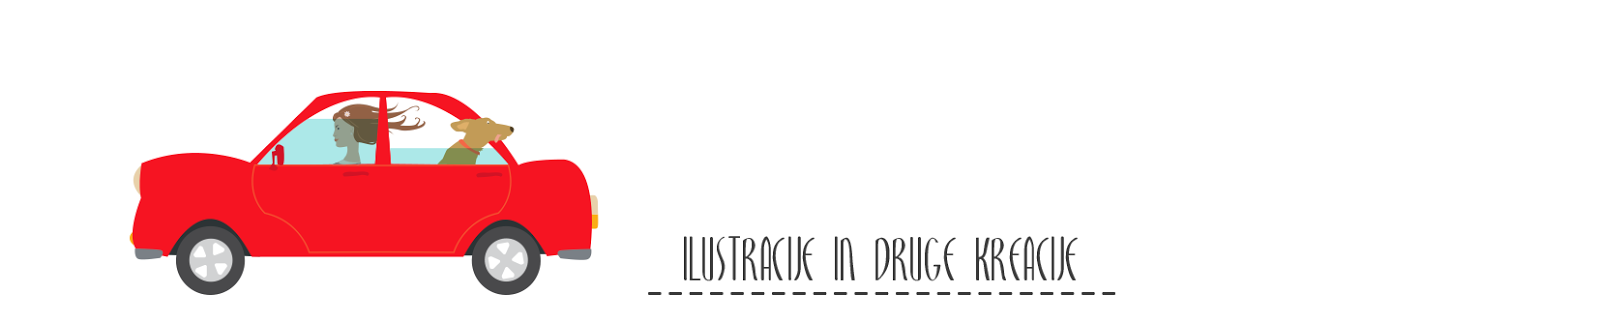 Ilustracije in druge kreacije